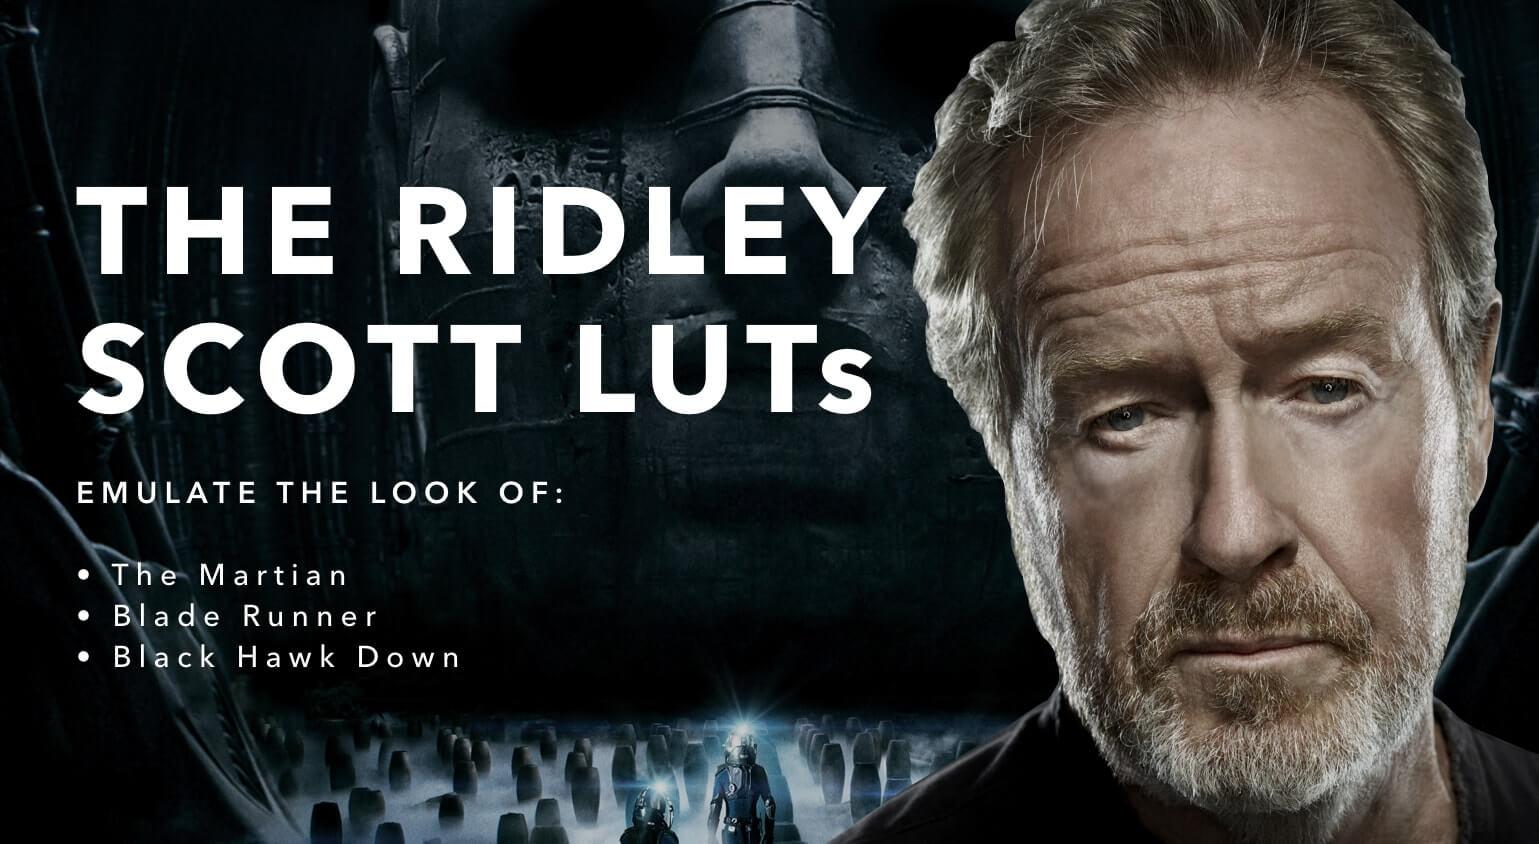 Ridley Scott LUTs Pack - StudioBinder